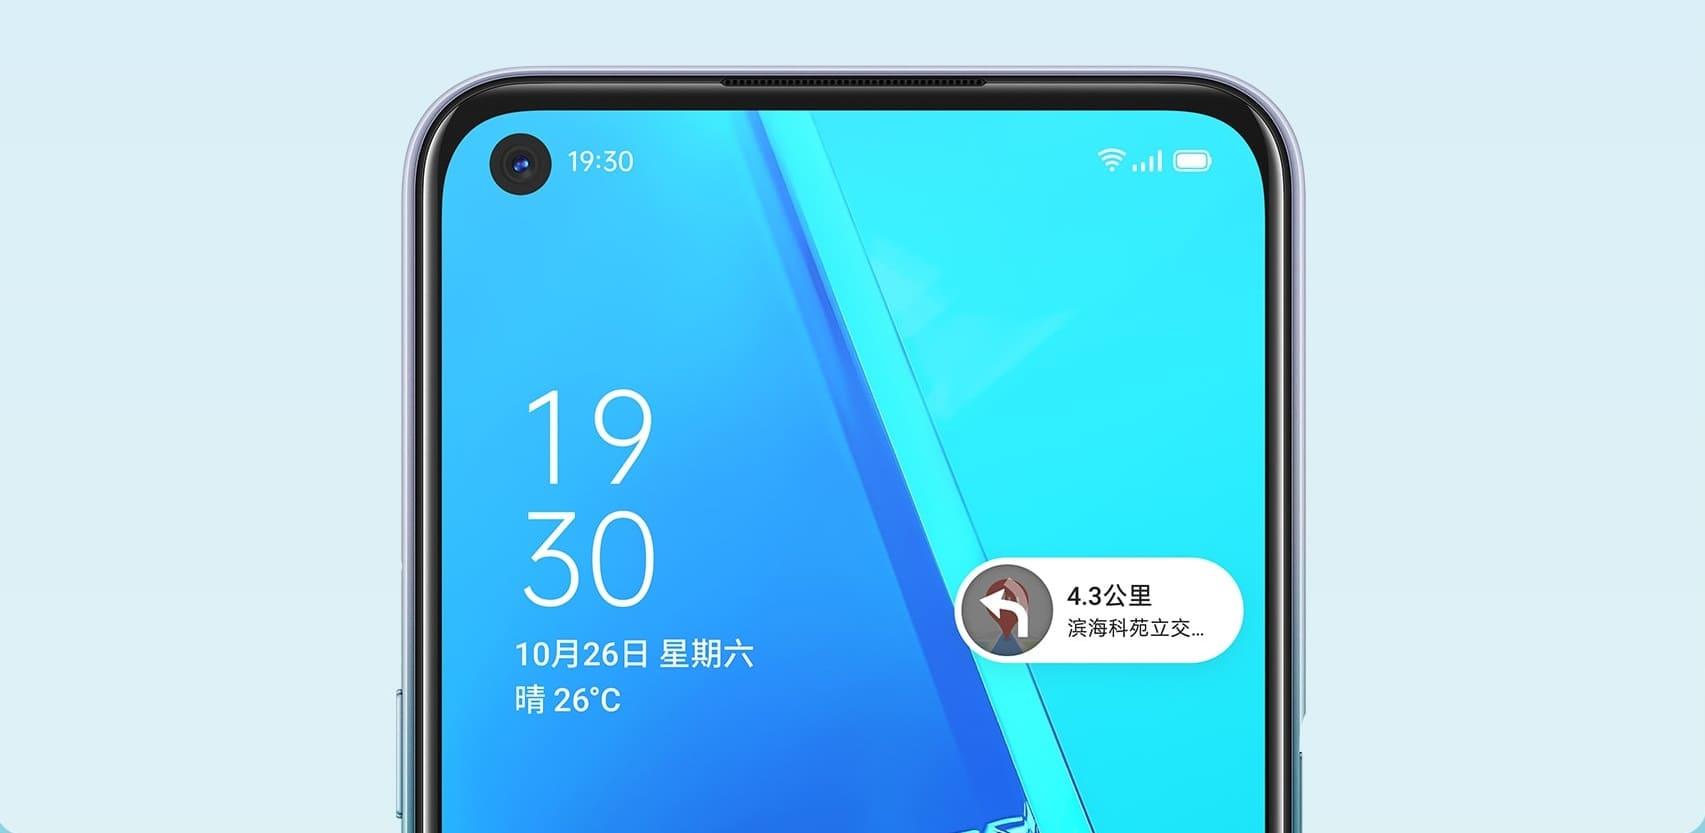 OPPO выпустила новый смартфон OPPO A52 с квадрокамерой